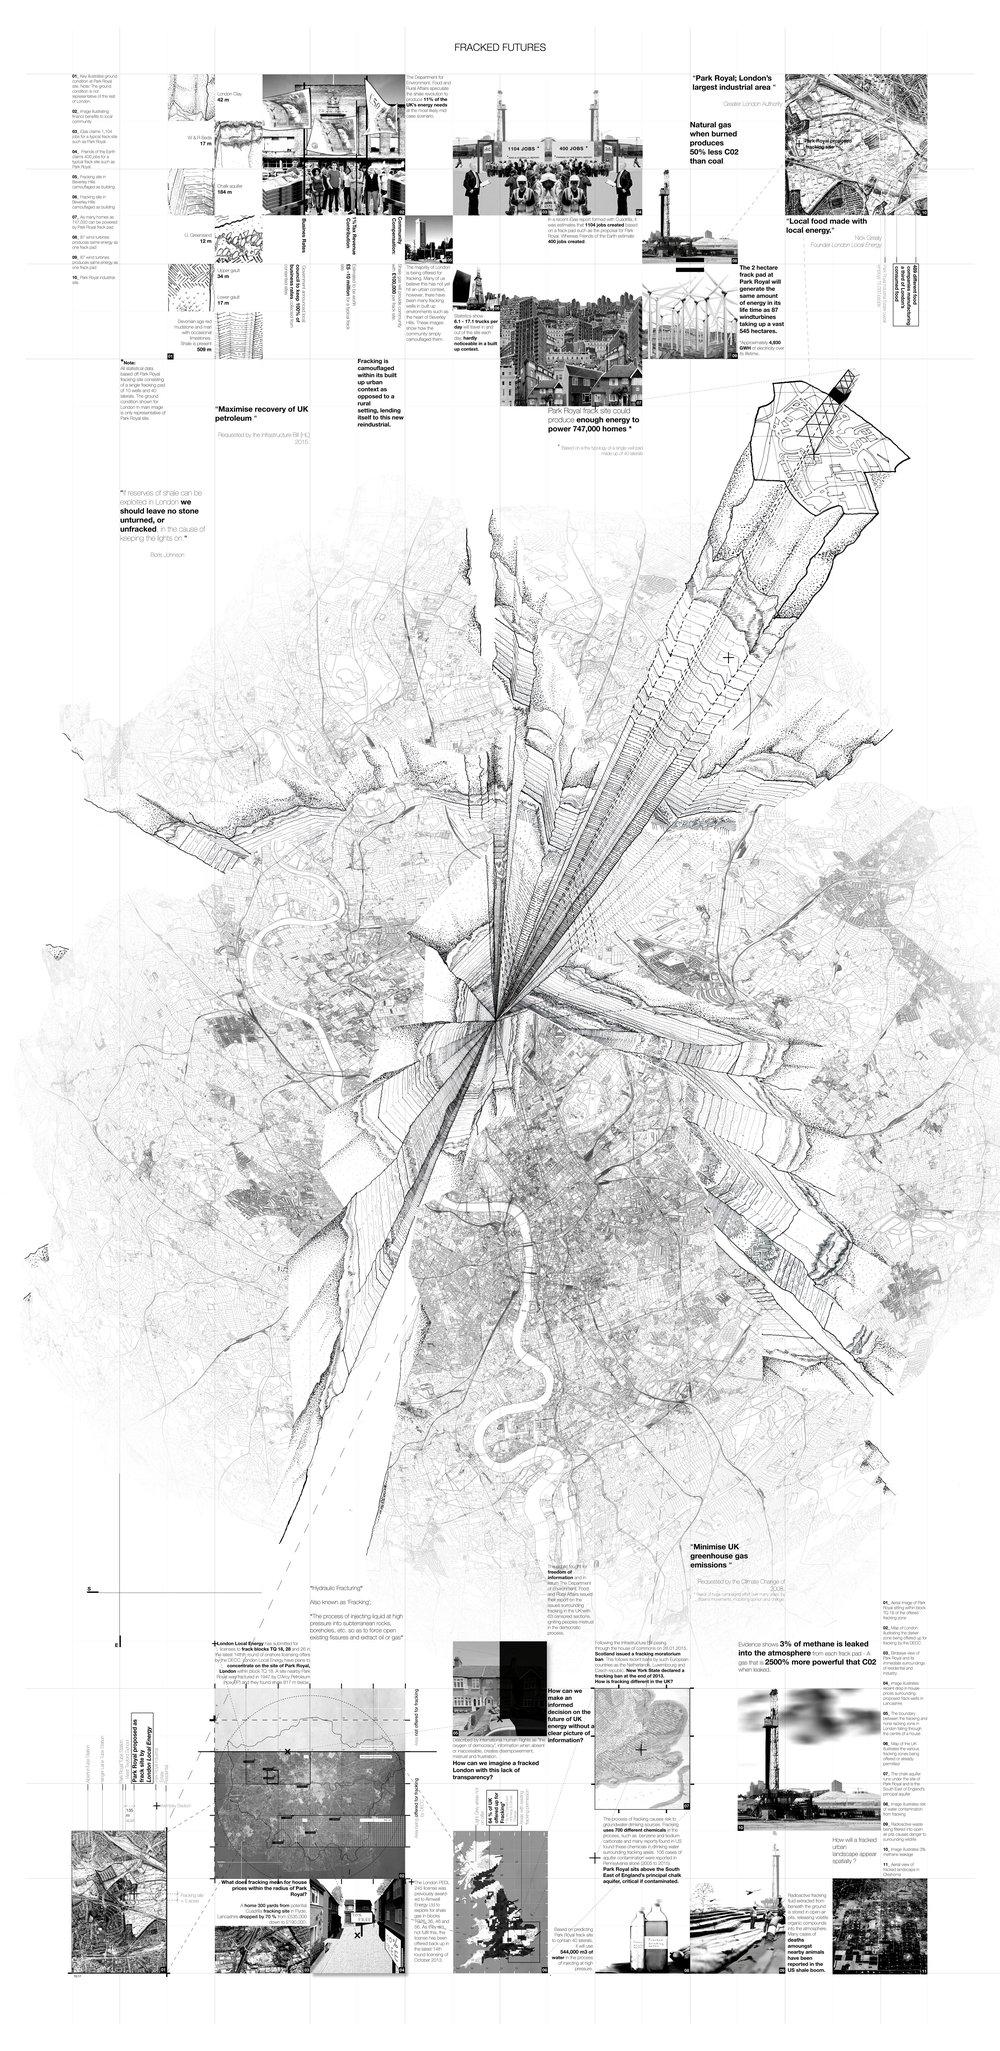 Drawn analysis of physical urban fracktures